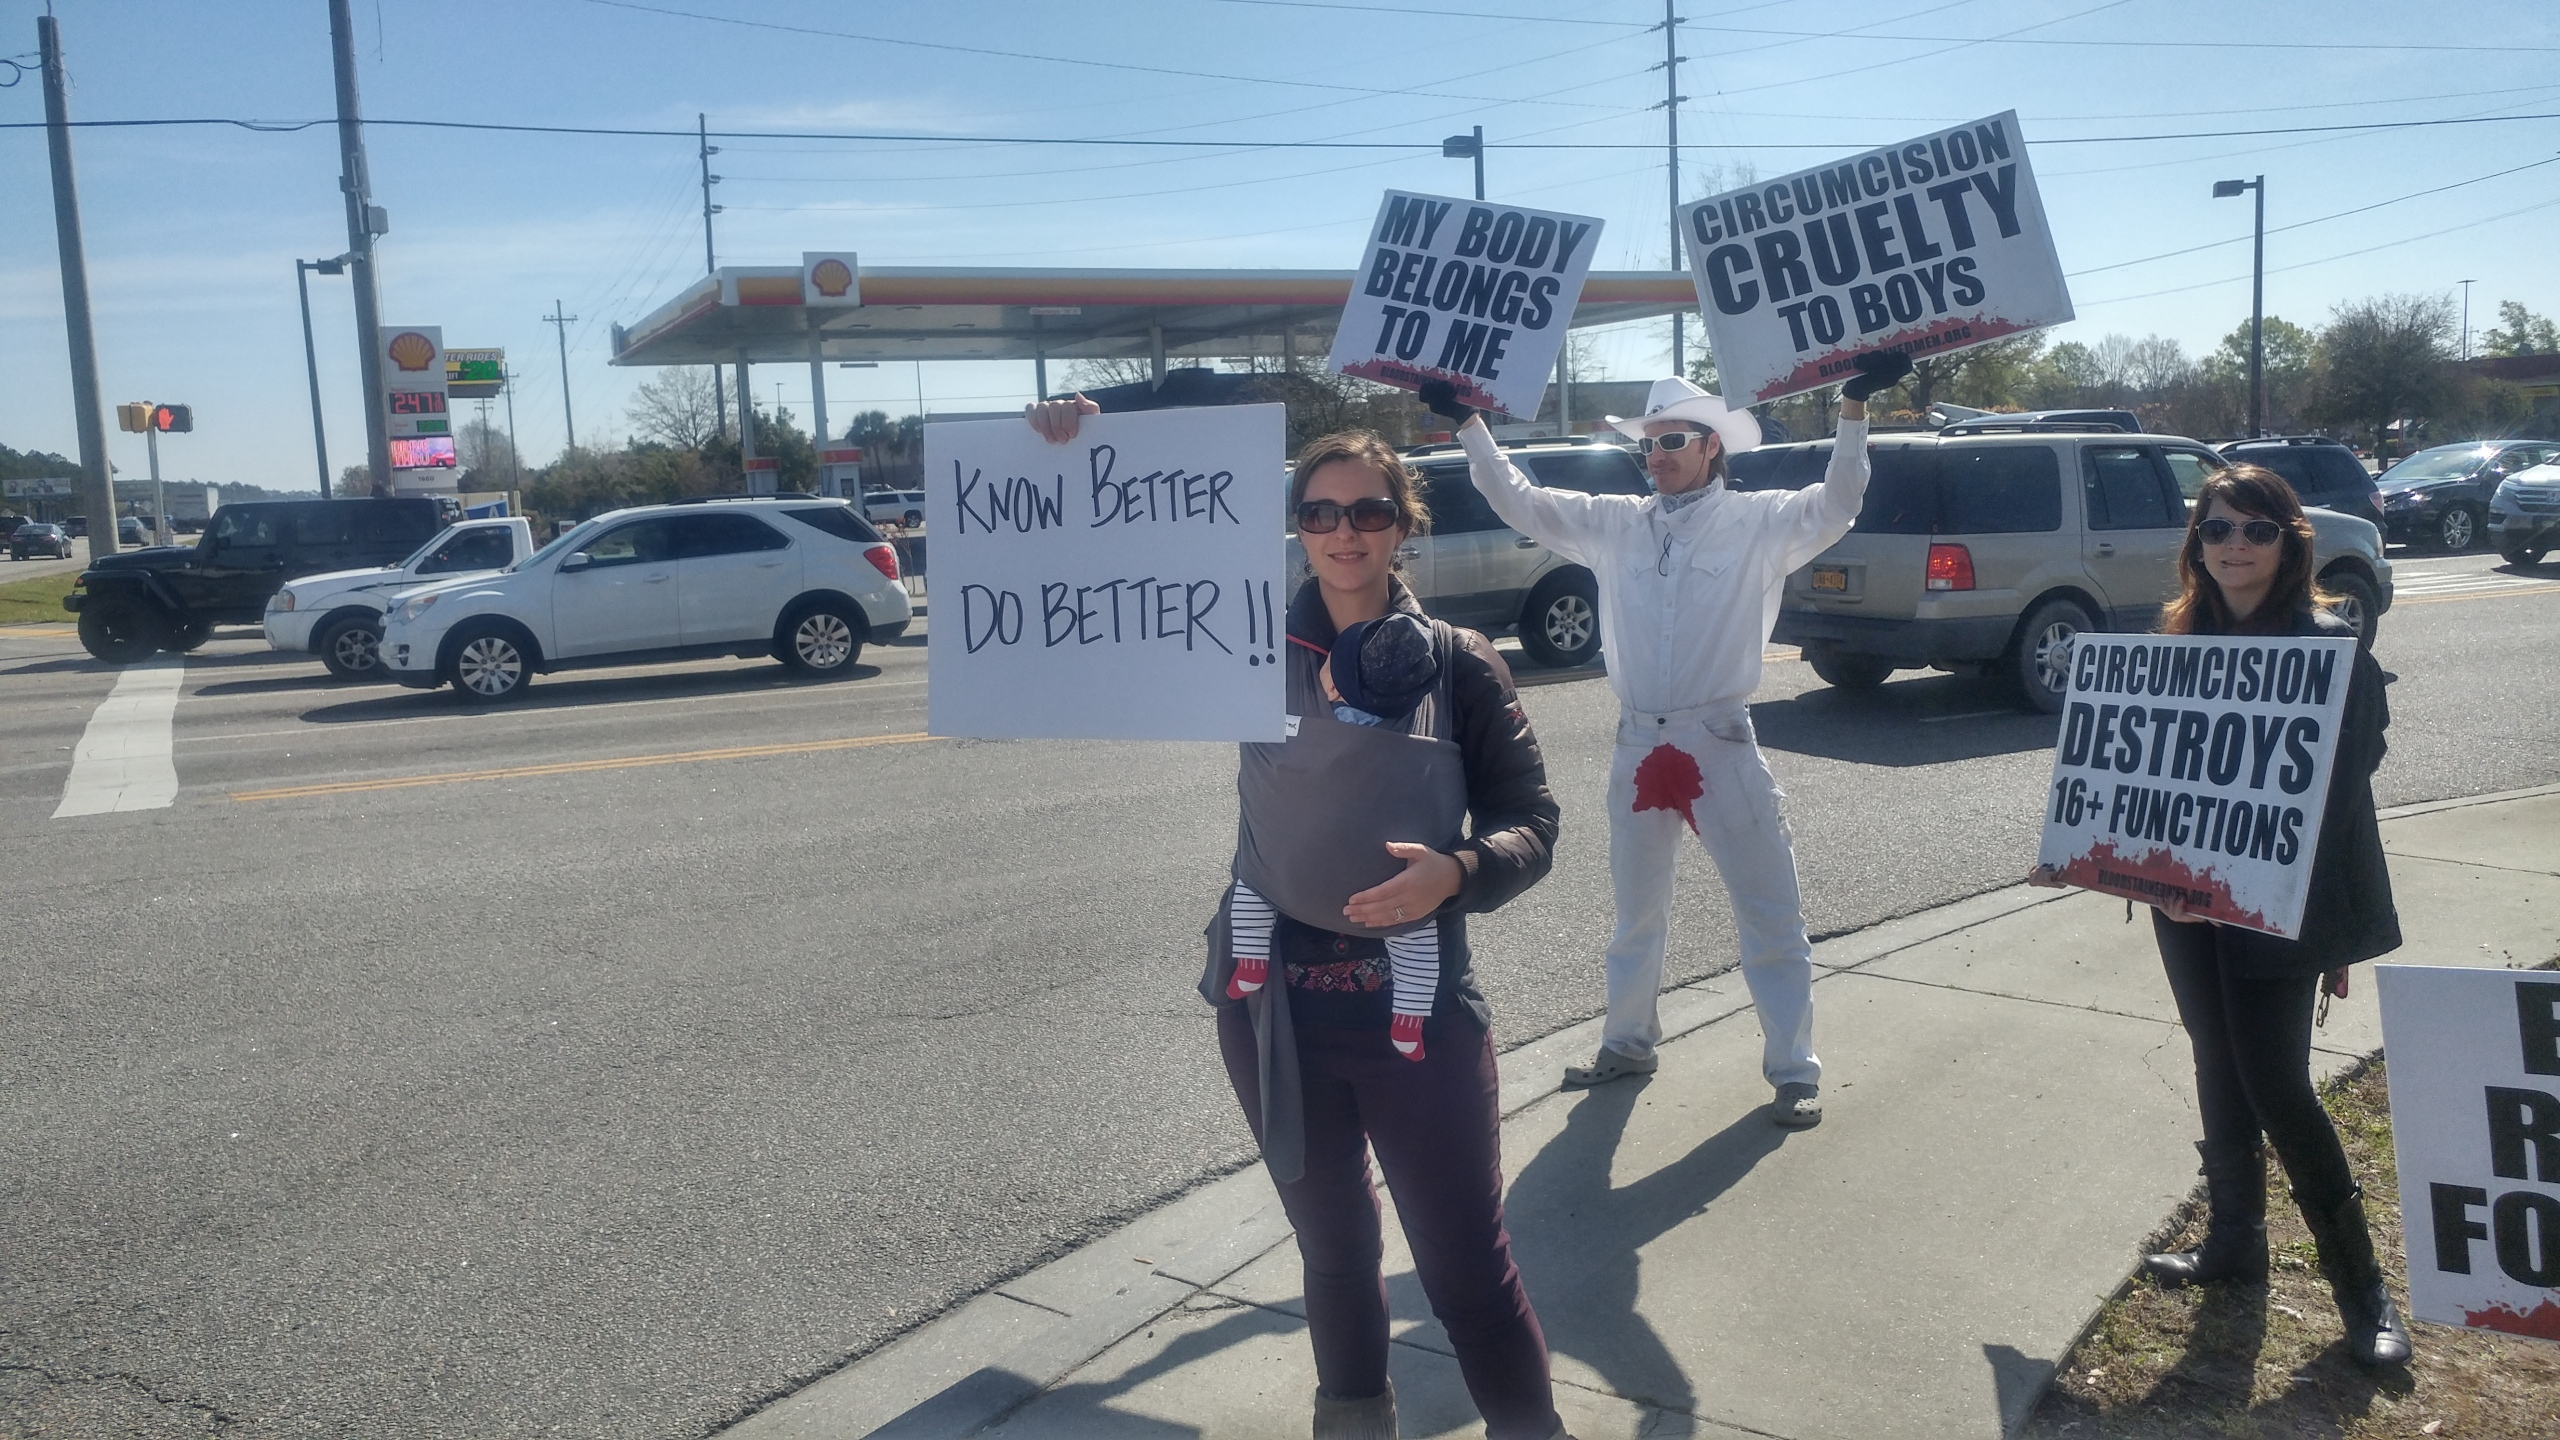 bloodstained-men-protest_1522256696451.jpg